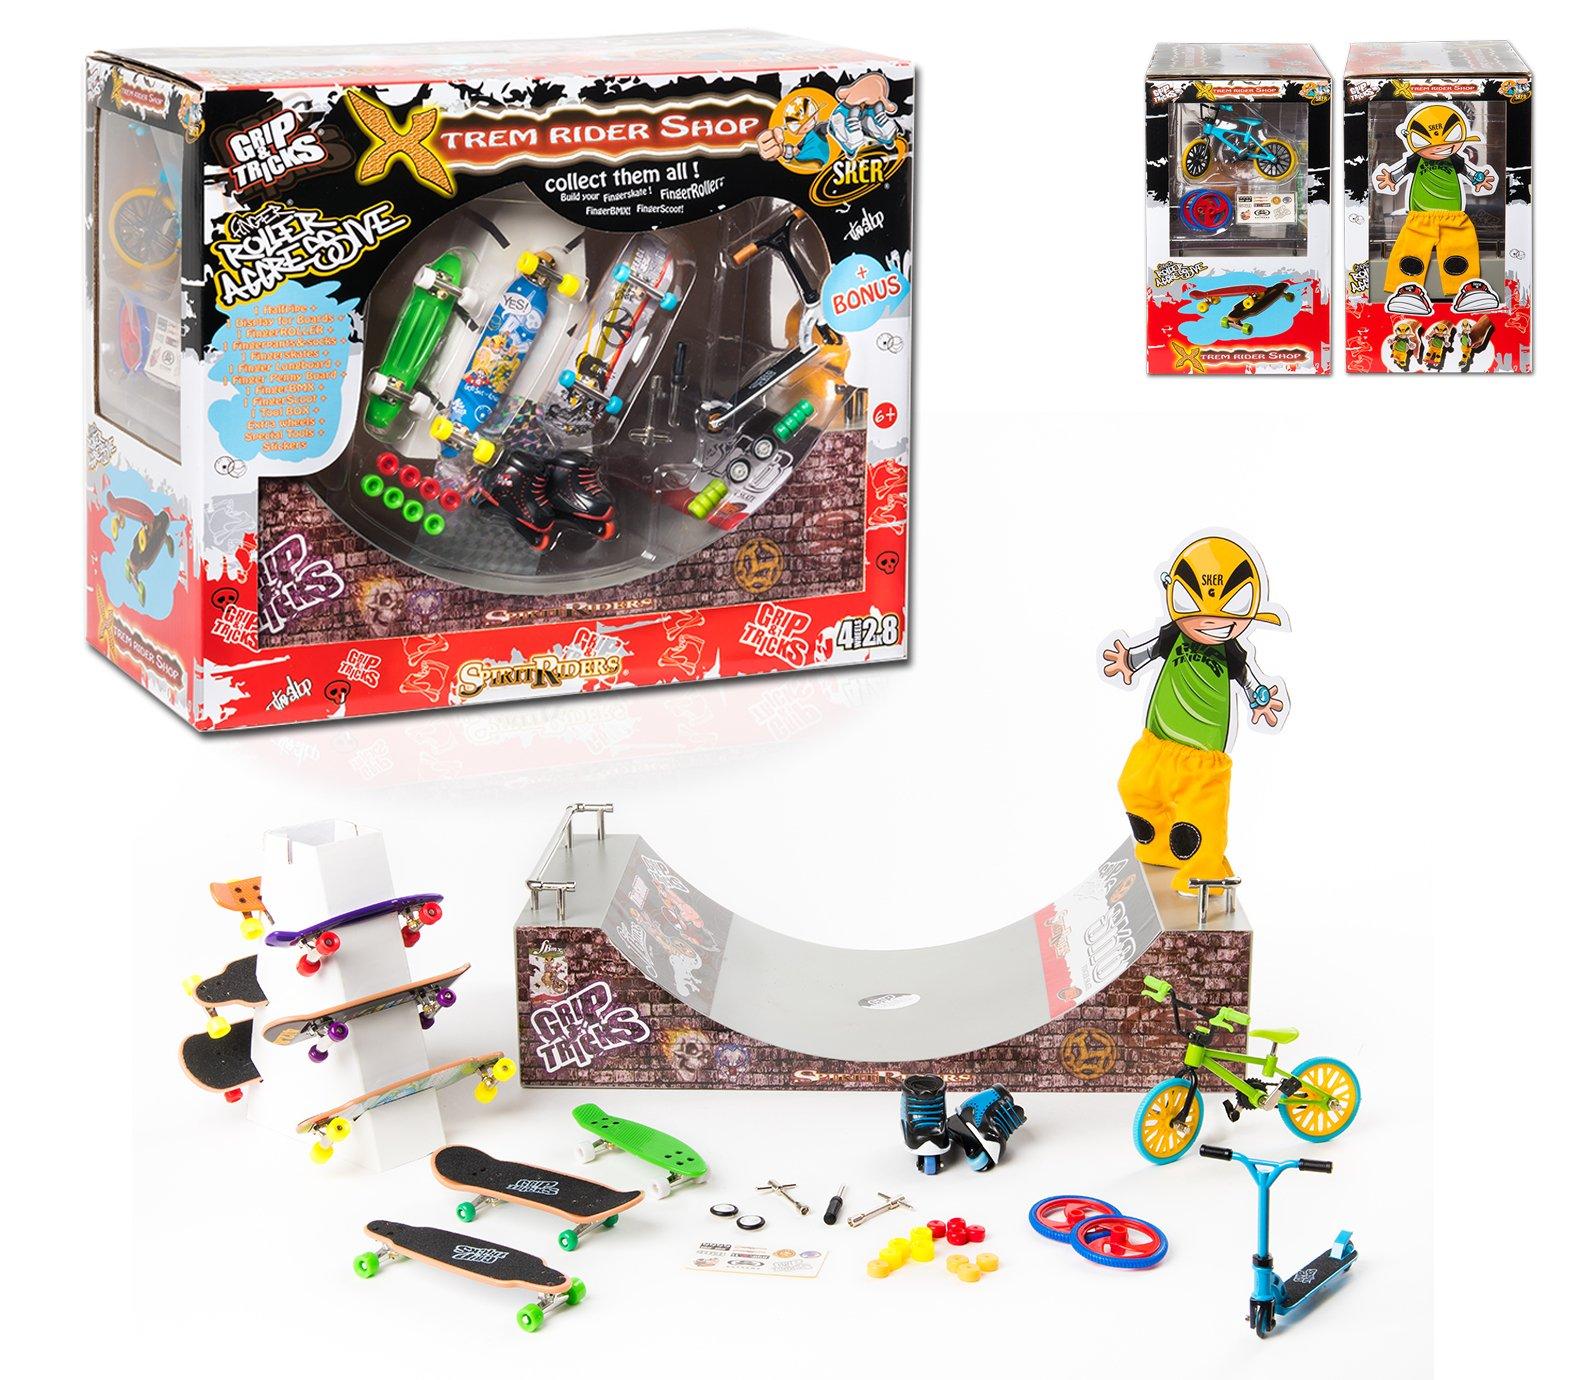 Grips & Tricks X-Trem Rider Shop by Grips & Tricks